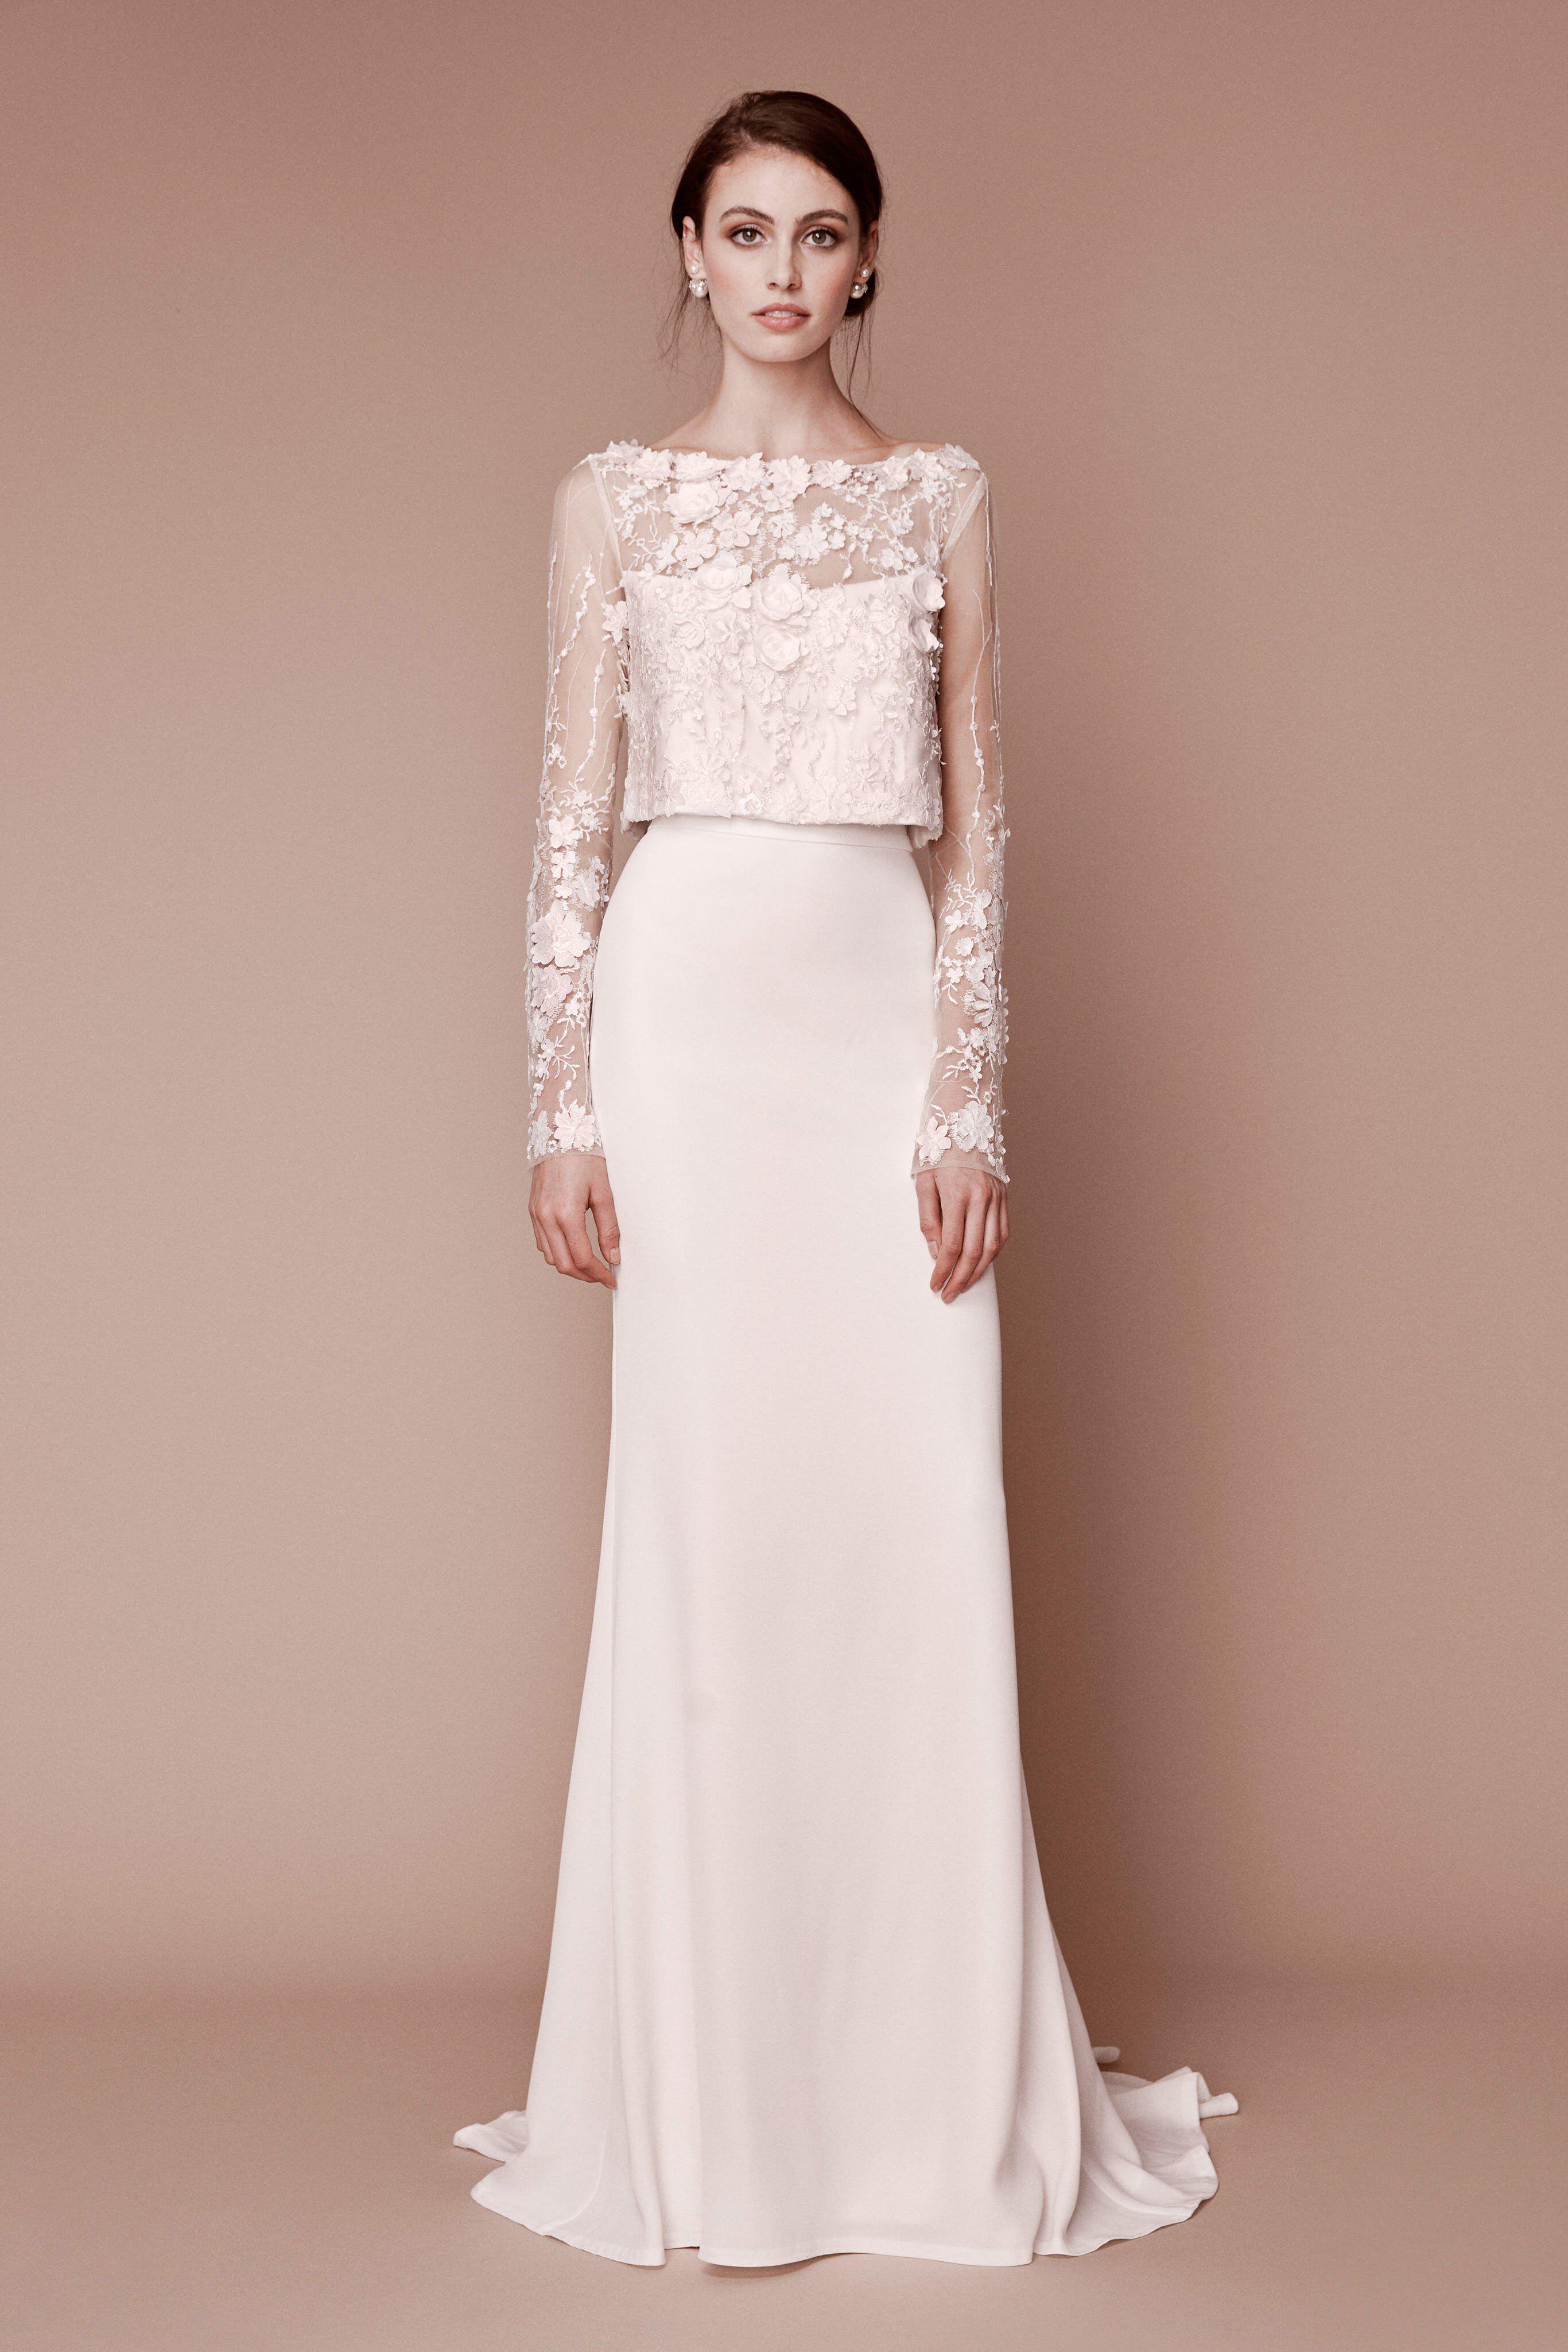 Lace wedding dress ivory january 2019 Tadashi Shoji Fall  Bridal Fashion Show Collection See the